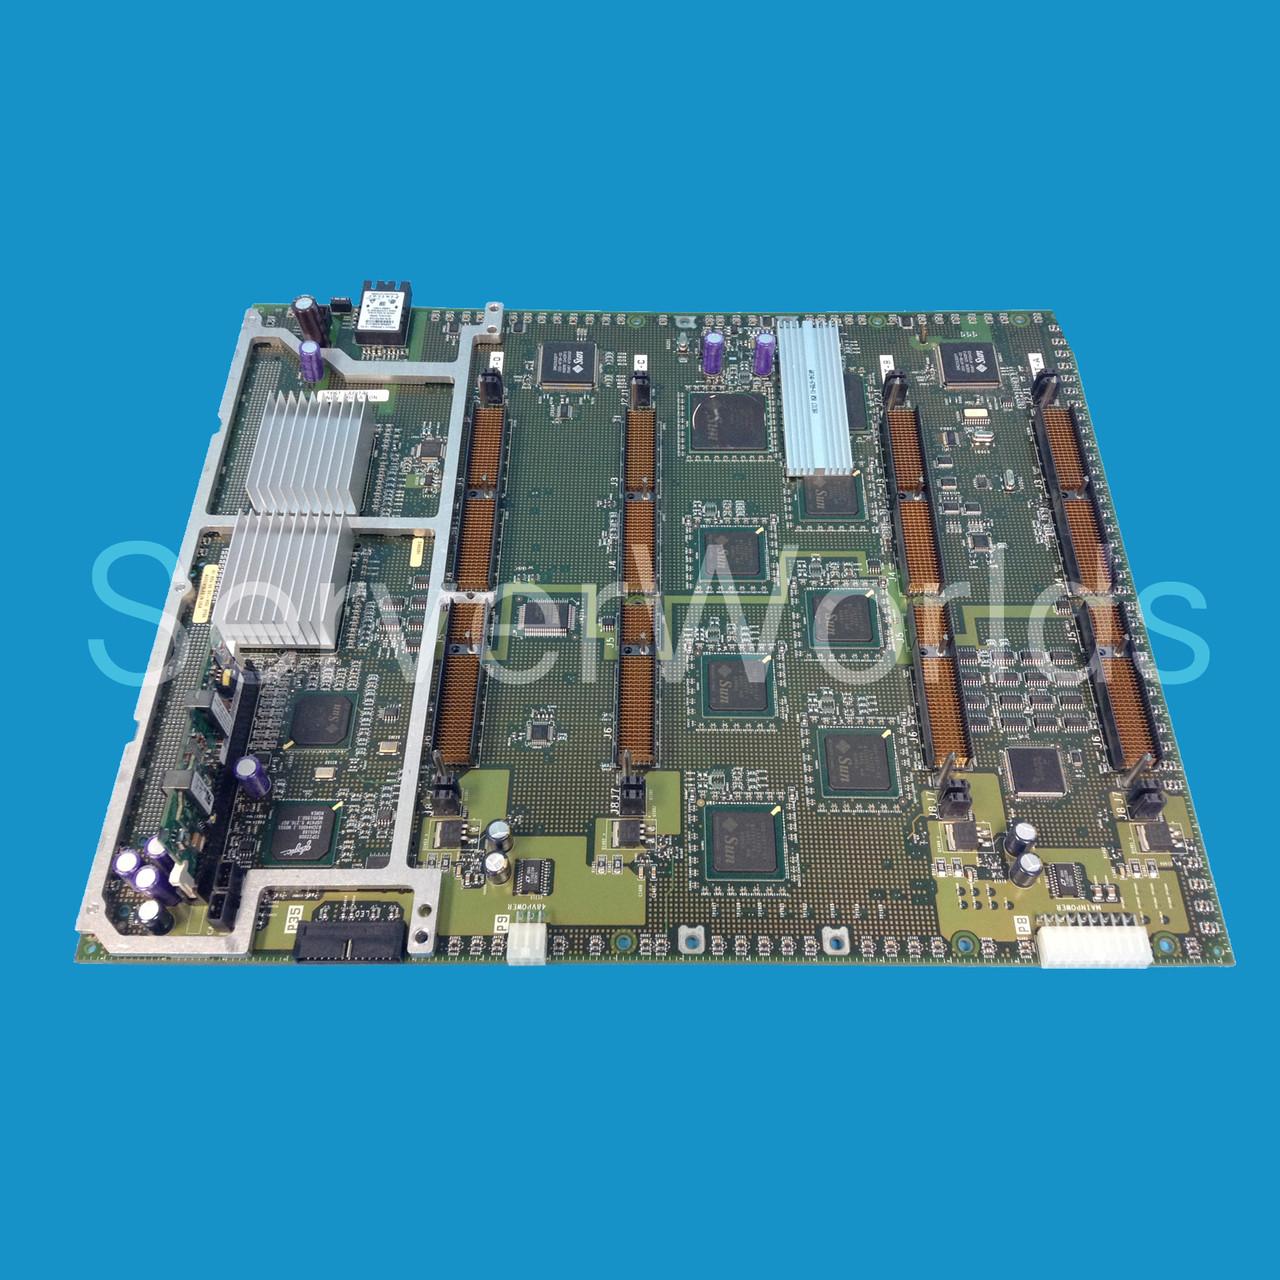 Sun 501-7199 | SunFire V890 Motherboard - Serverworlds